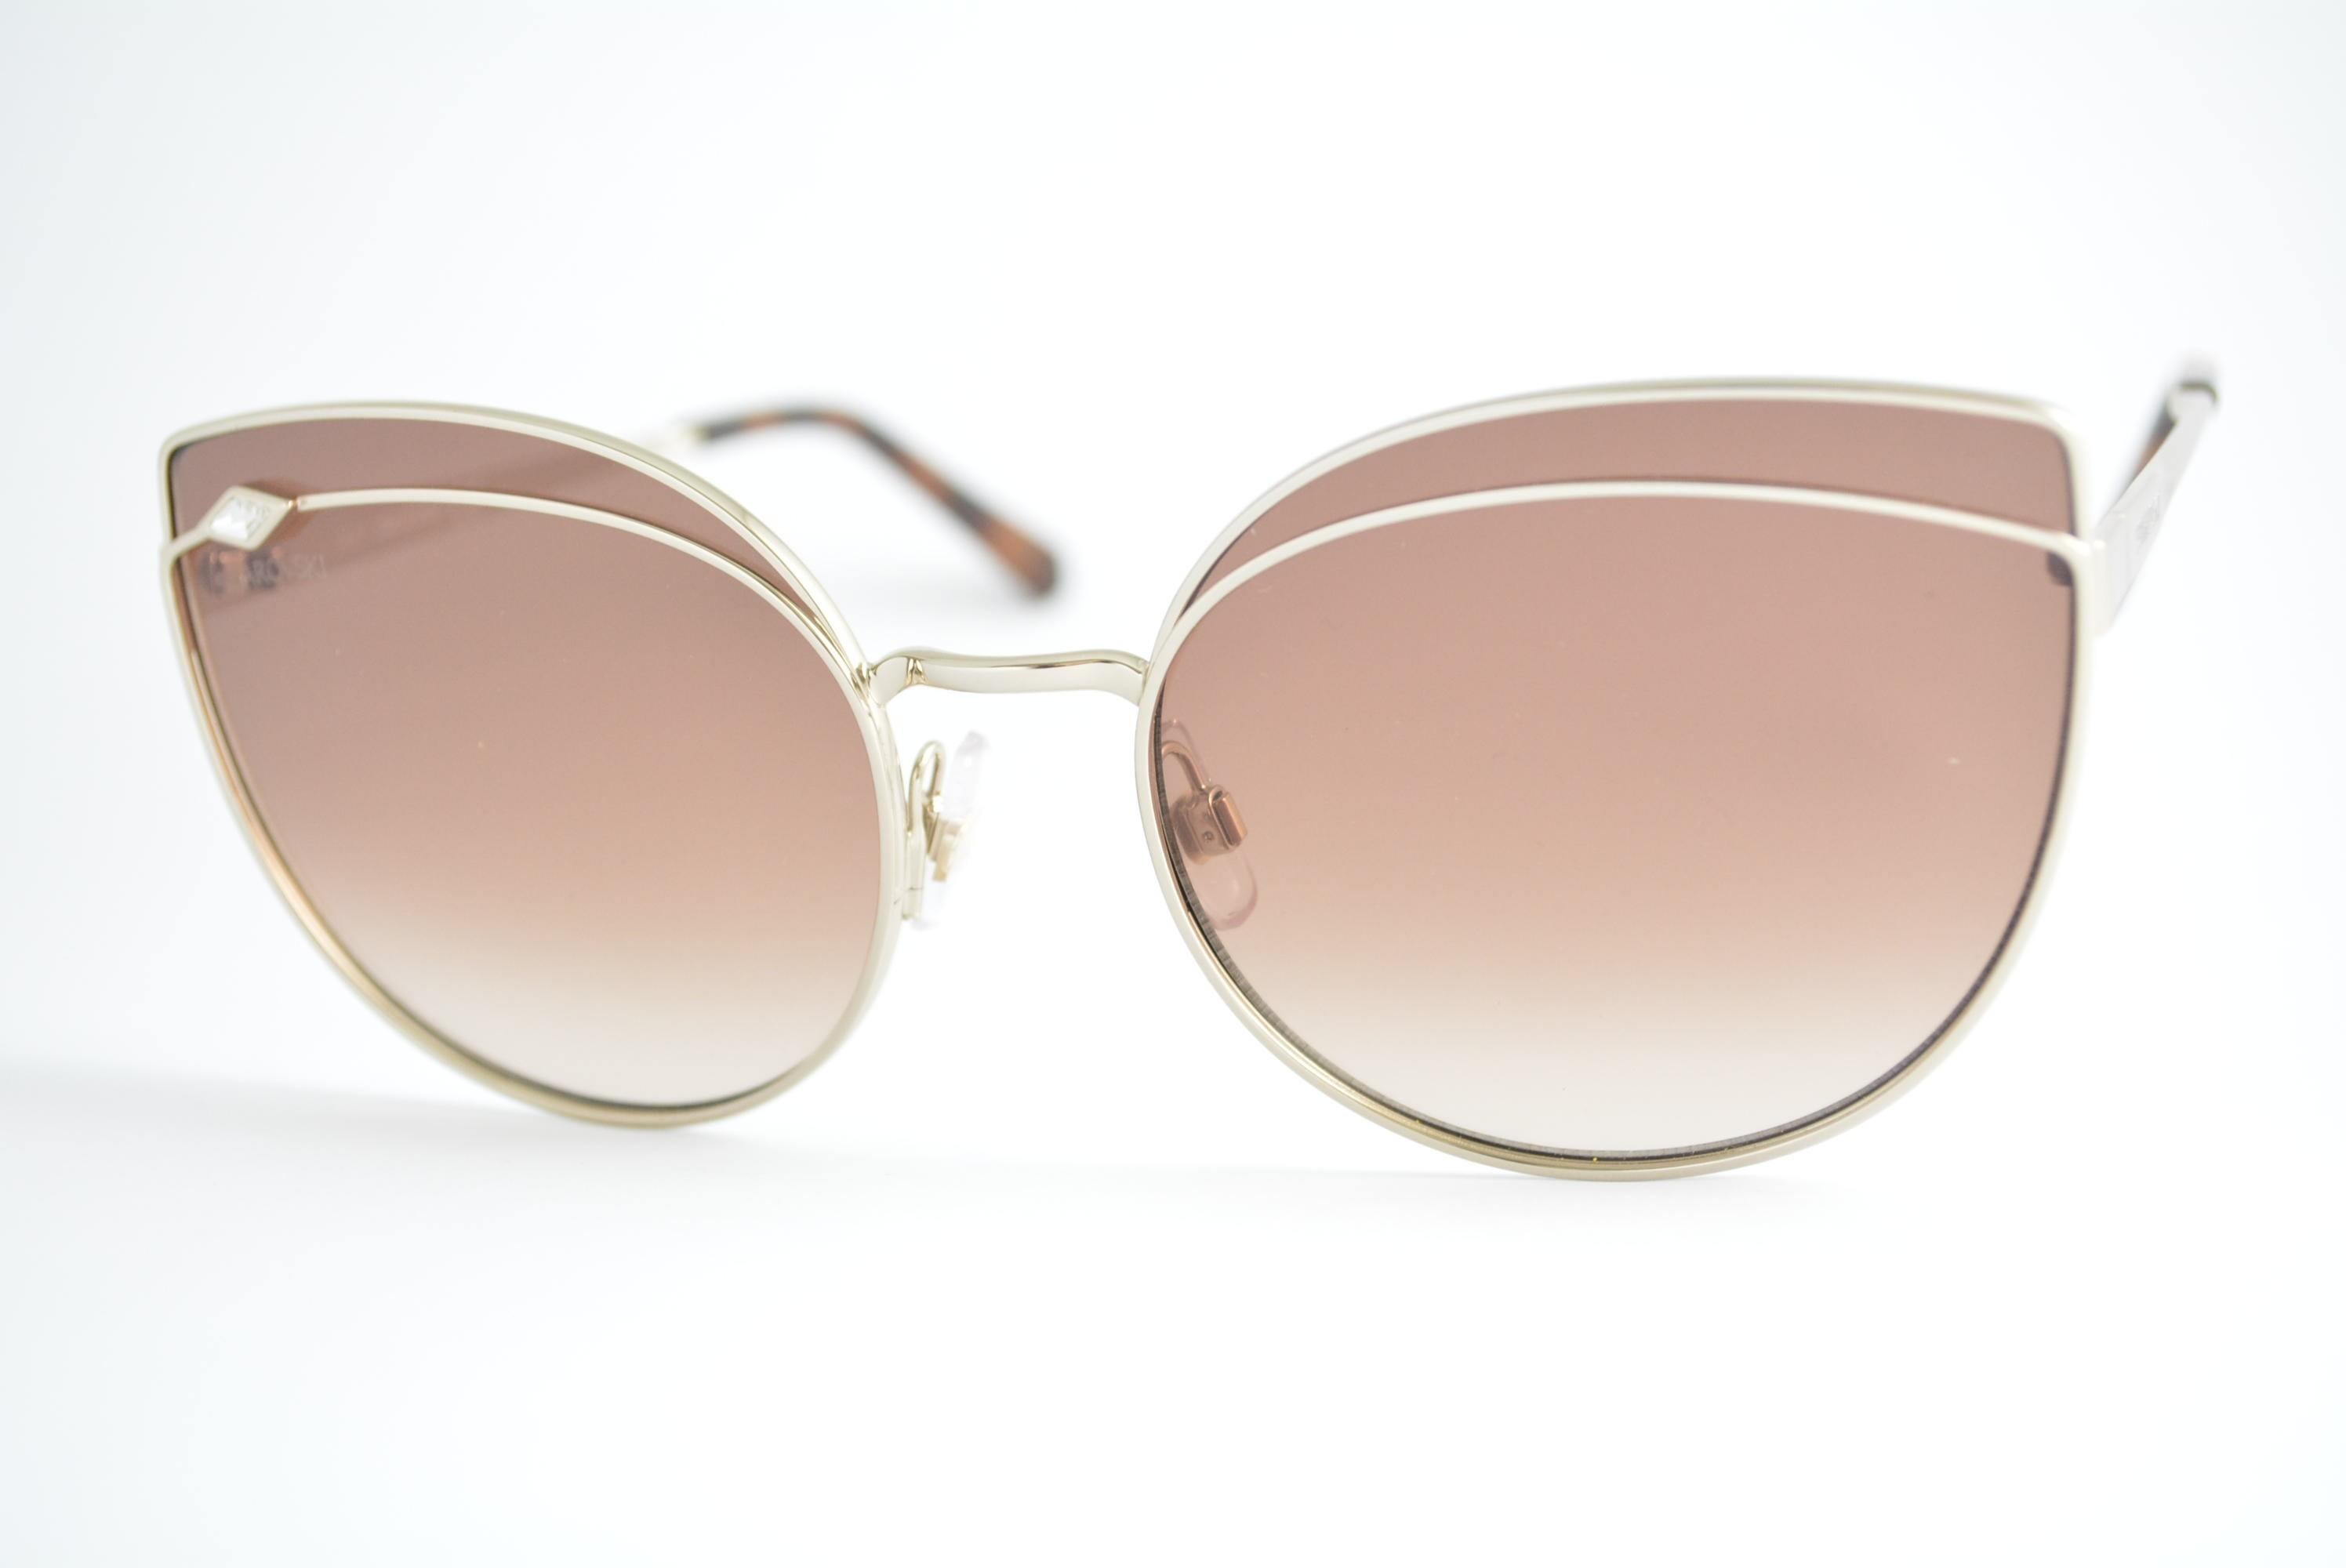 9509fc0b5 óculos de sol Swarovski mod sk172 32f Ótica Cardoso